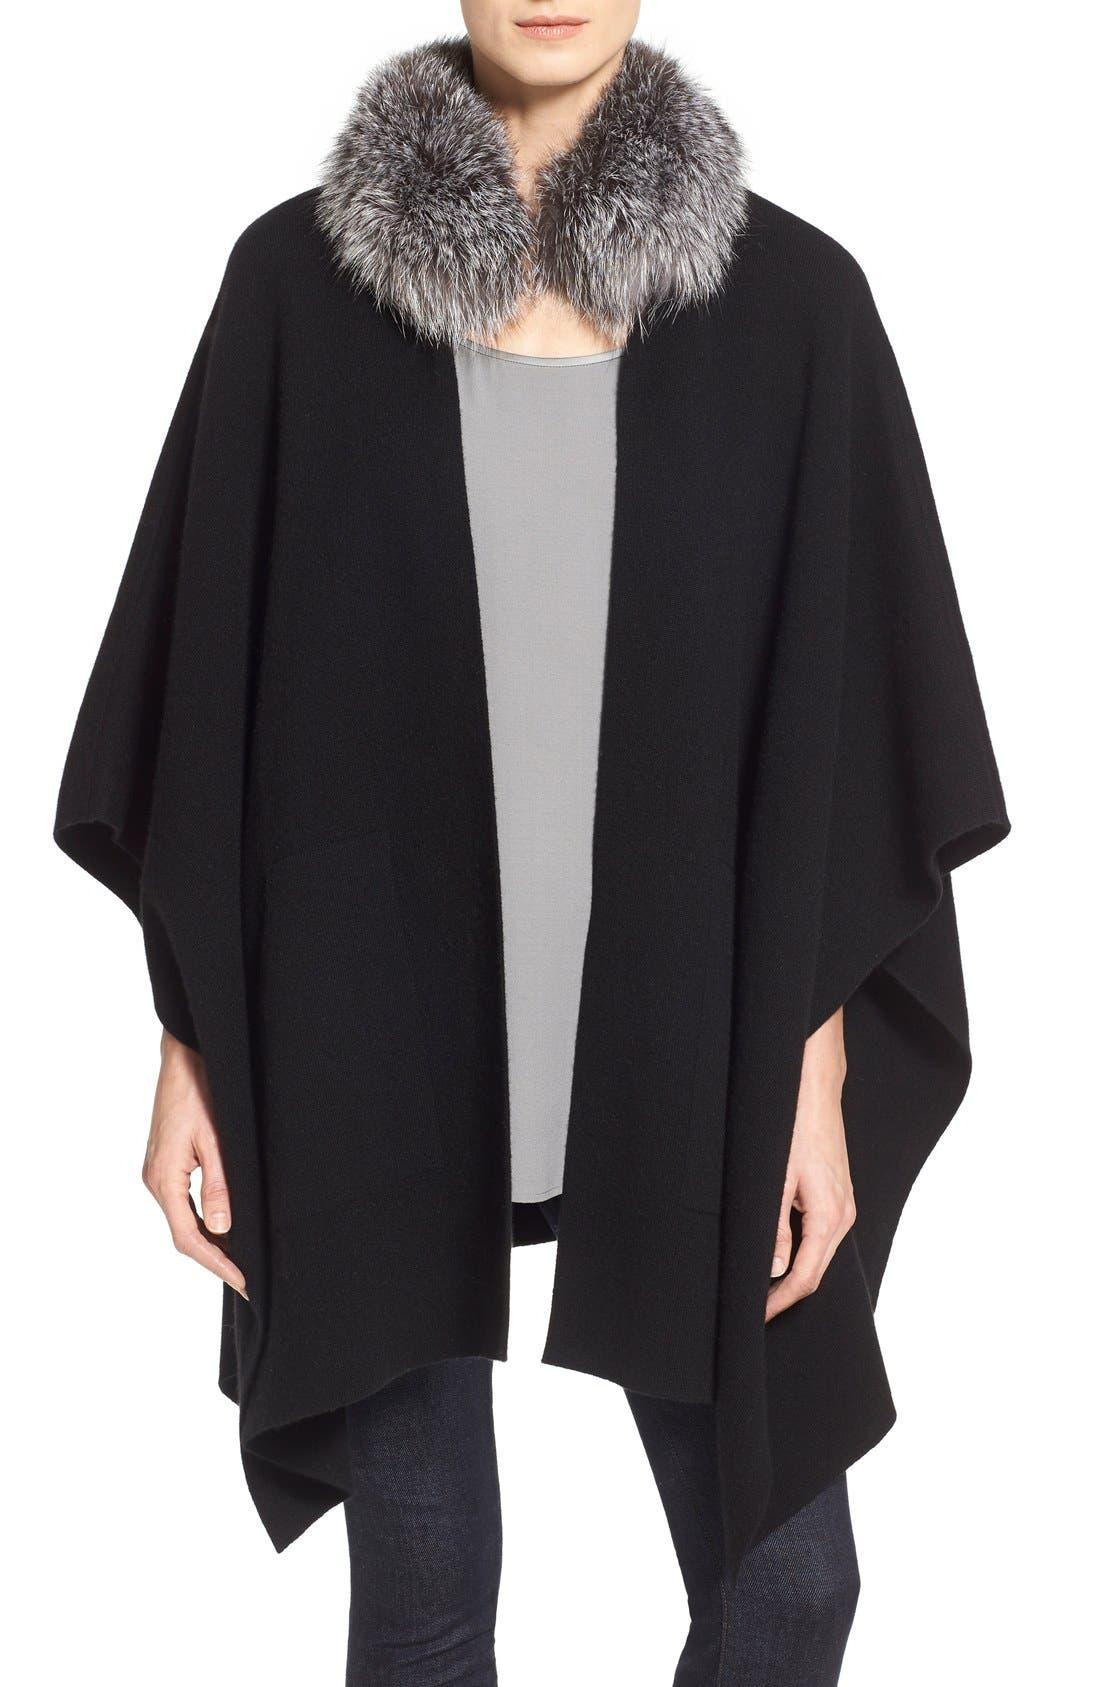 Alternate Image 1 Selected - Sofia Cashmere Genuine Fox Fur Collar Cashmere Cape